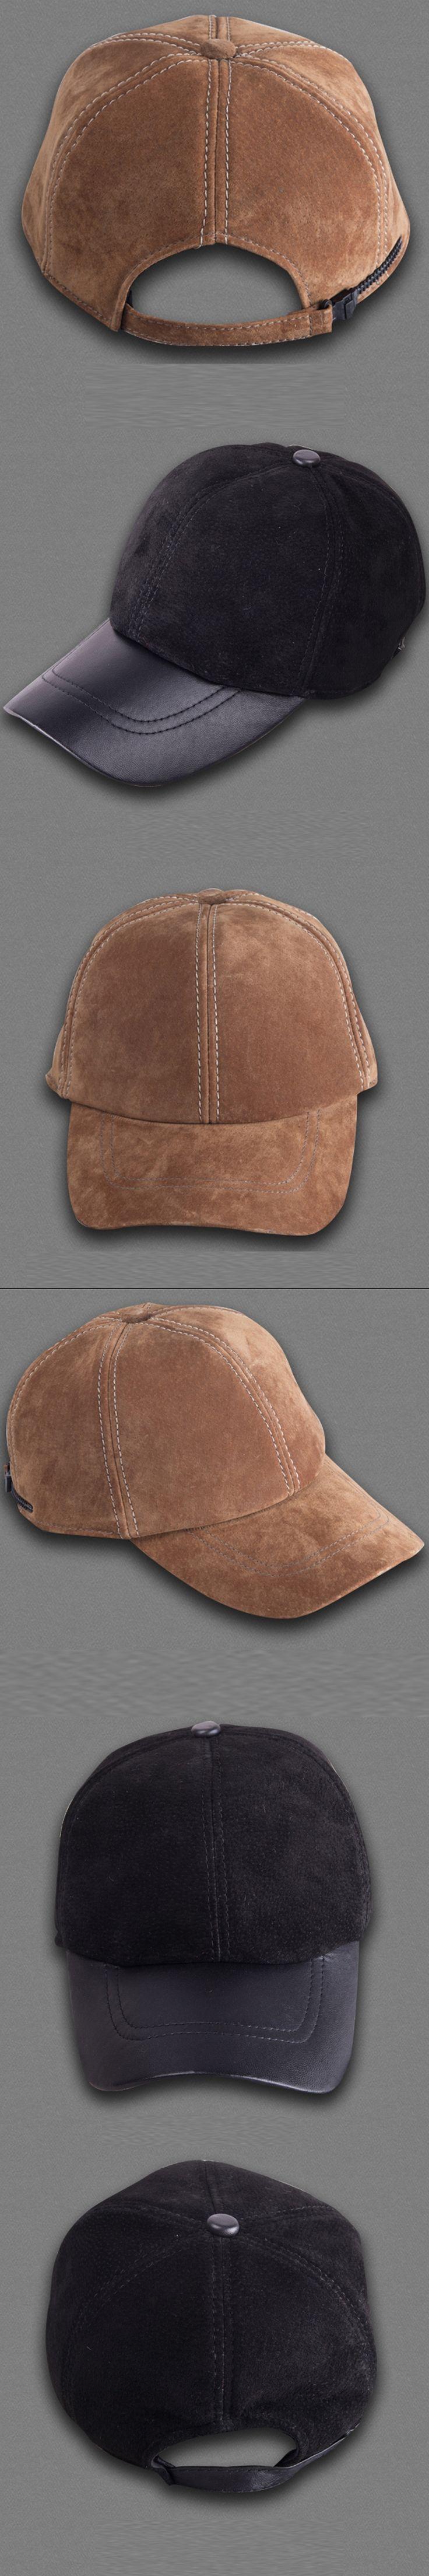 Svadilfari 2017 new arrival 100% high quality genuine leather baseball cap hat brand real cow skin leather hats/caps man woman